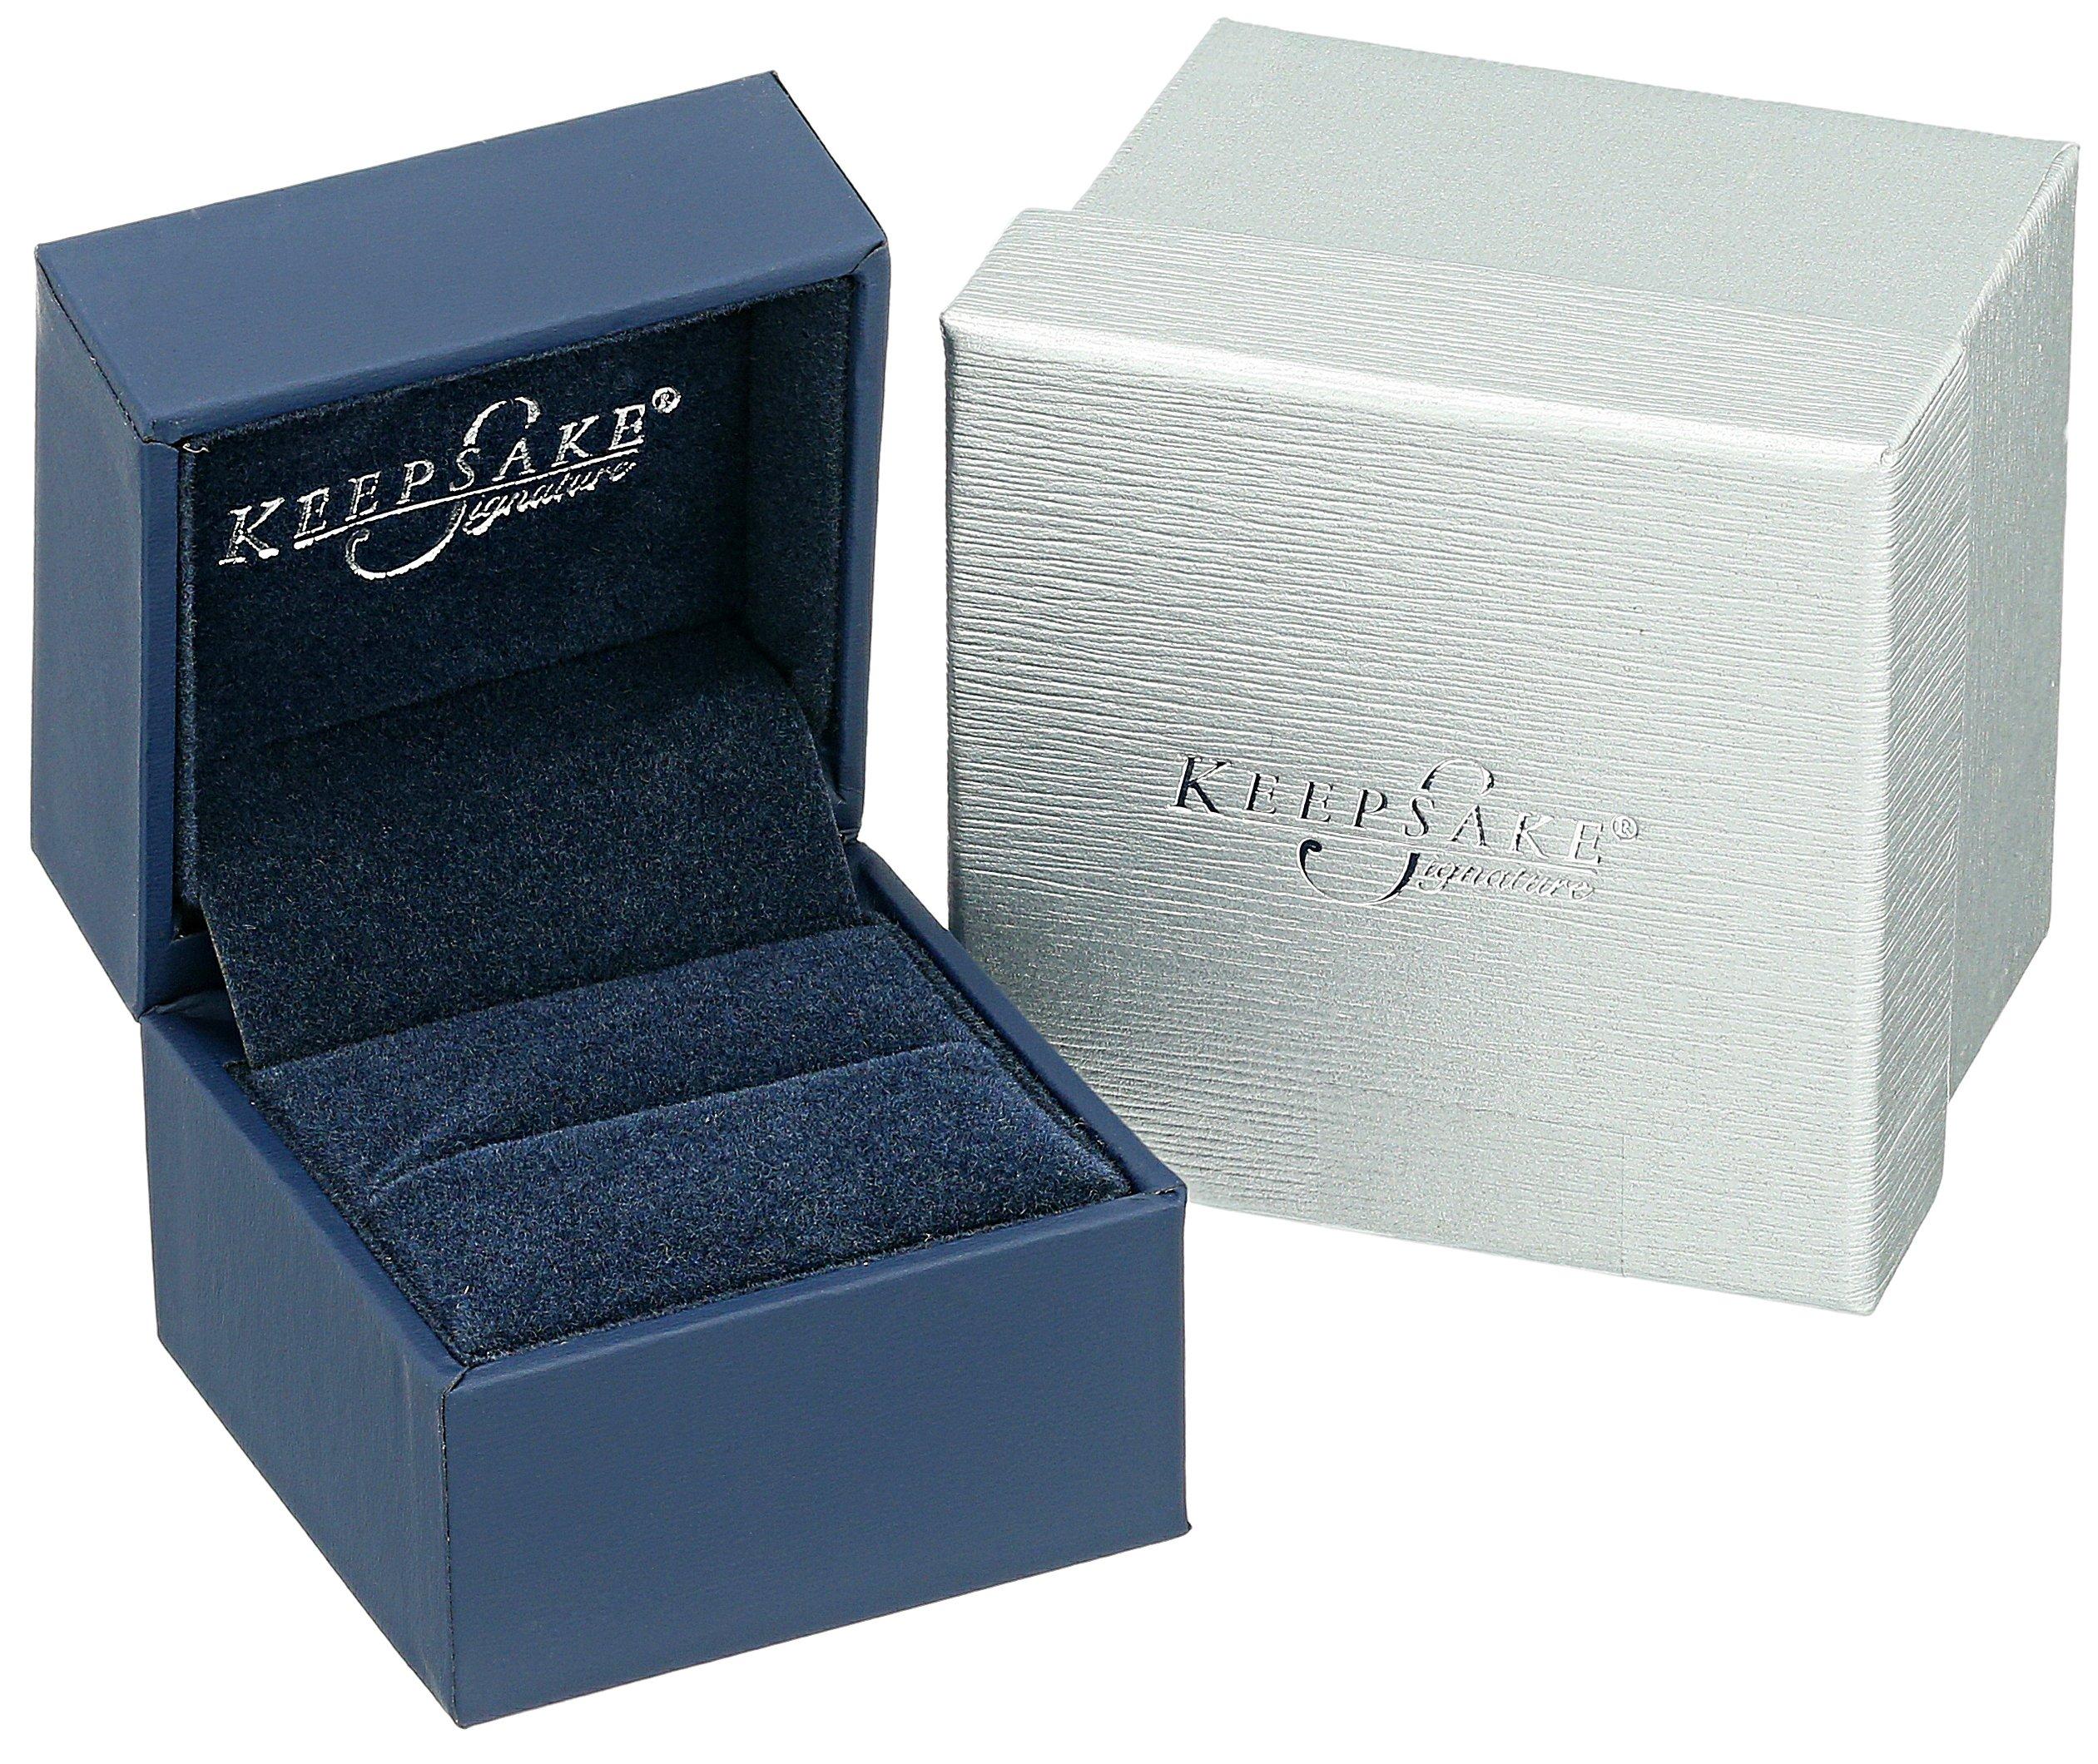 Keepsake Signature 14k White Gold Diamond Three-Stone Engagement Ring (1cttw, H-I Color, I1 Clarity), Size 7 by Amazon Collection (Image #4)